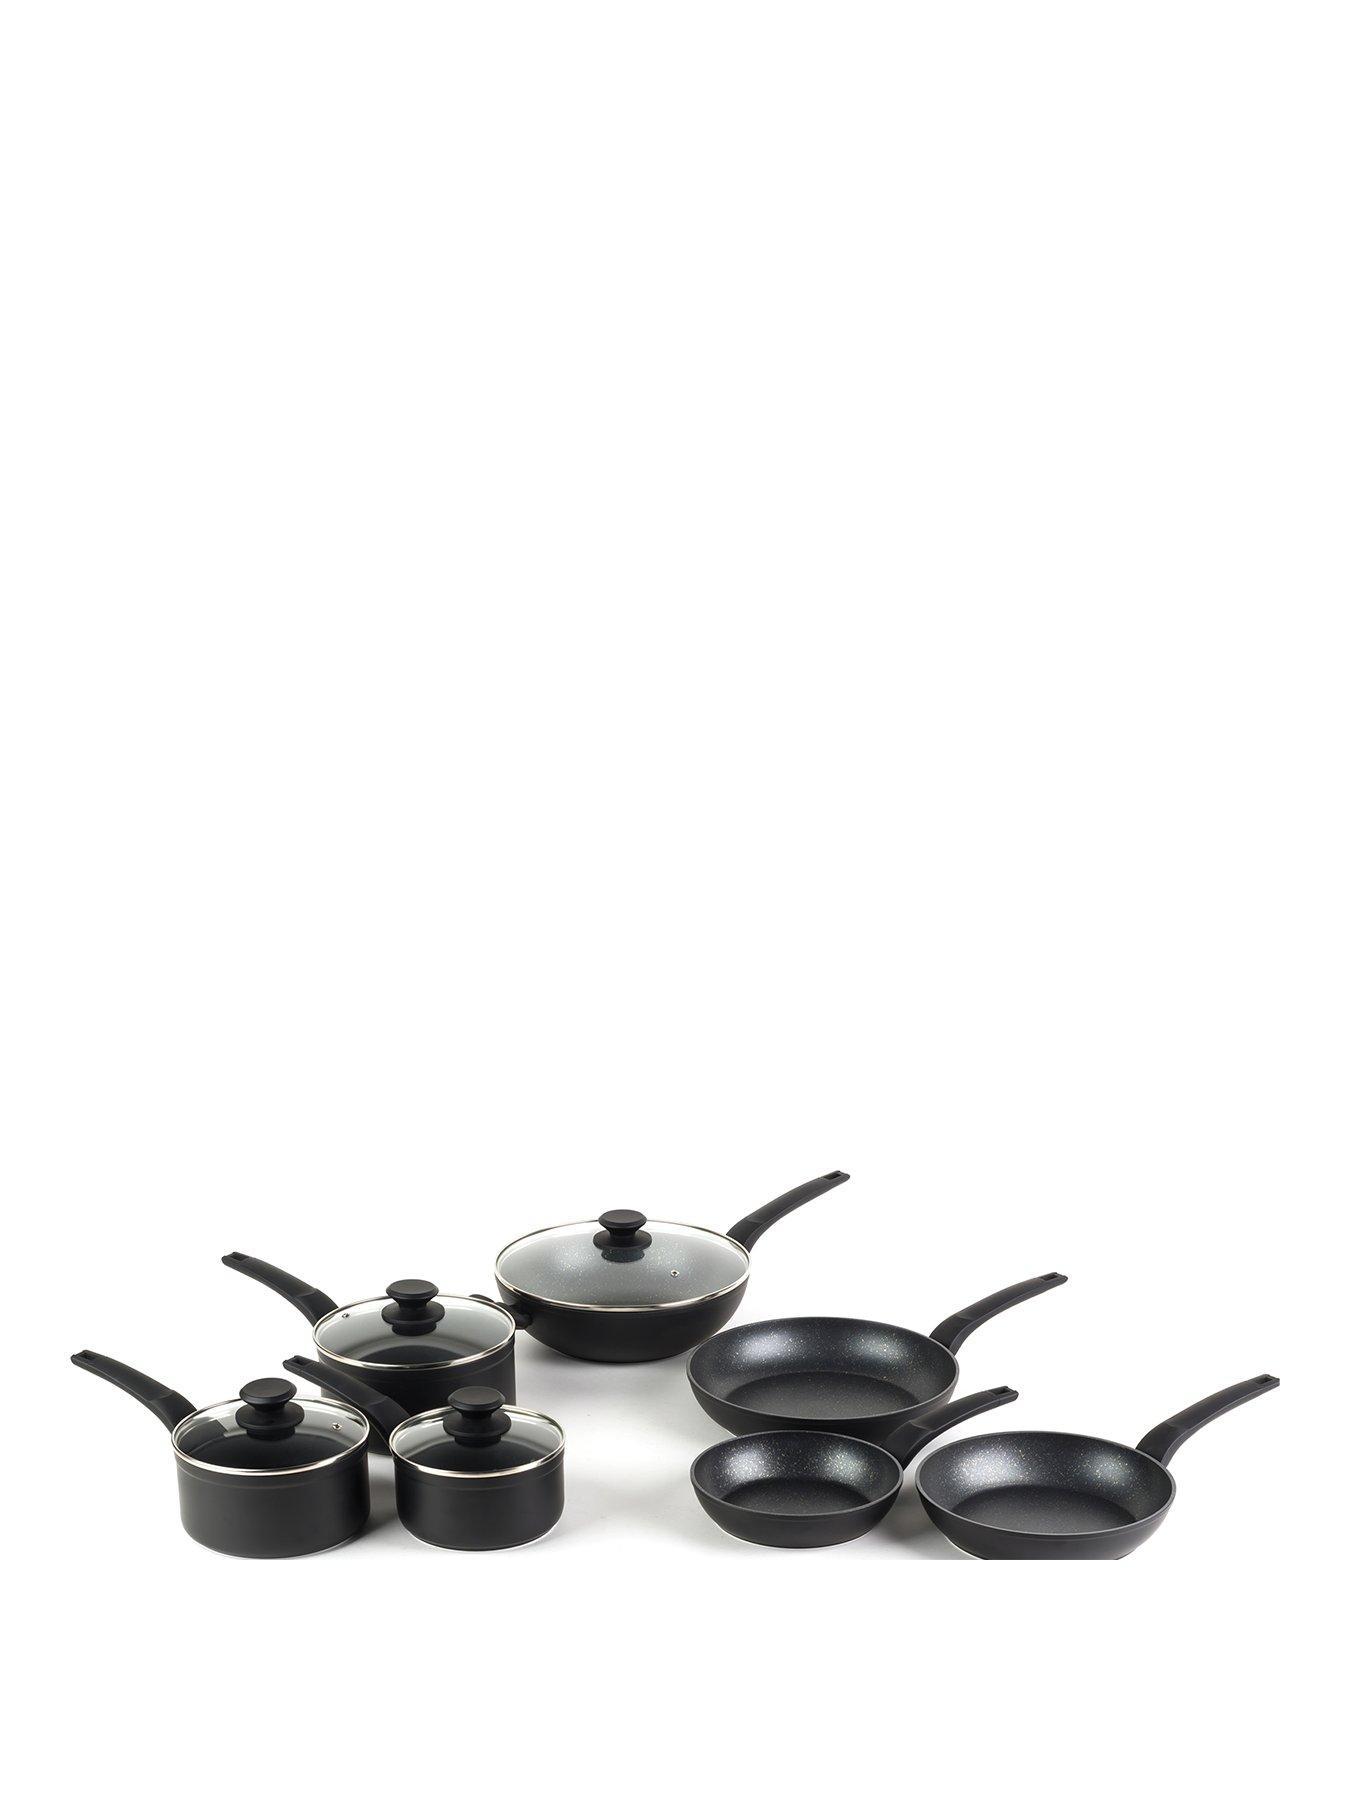 Copper Ceramic Cookware Frying Pan 20cm Non Stick Saucepans /& Frying Pans